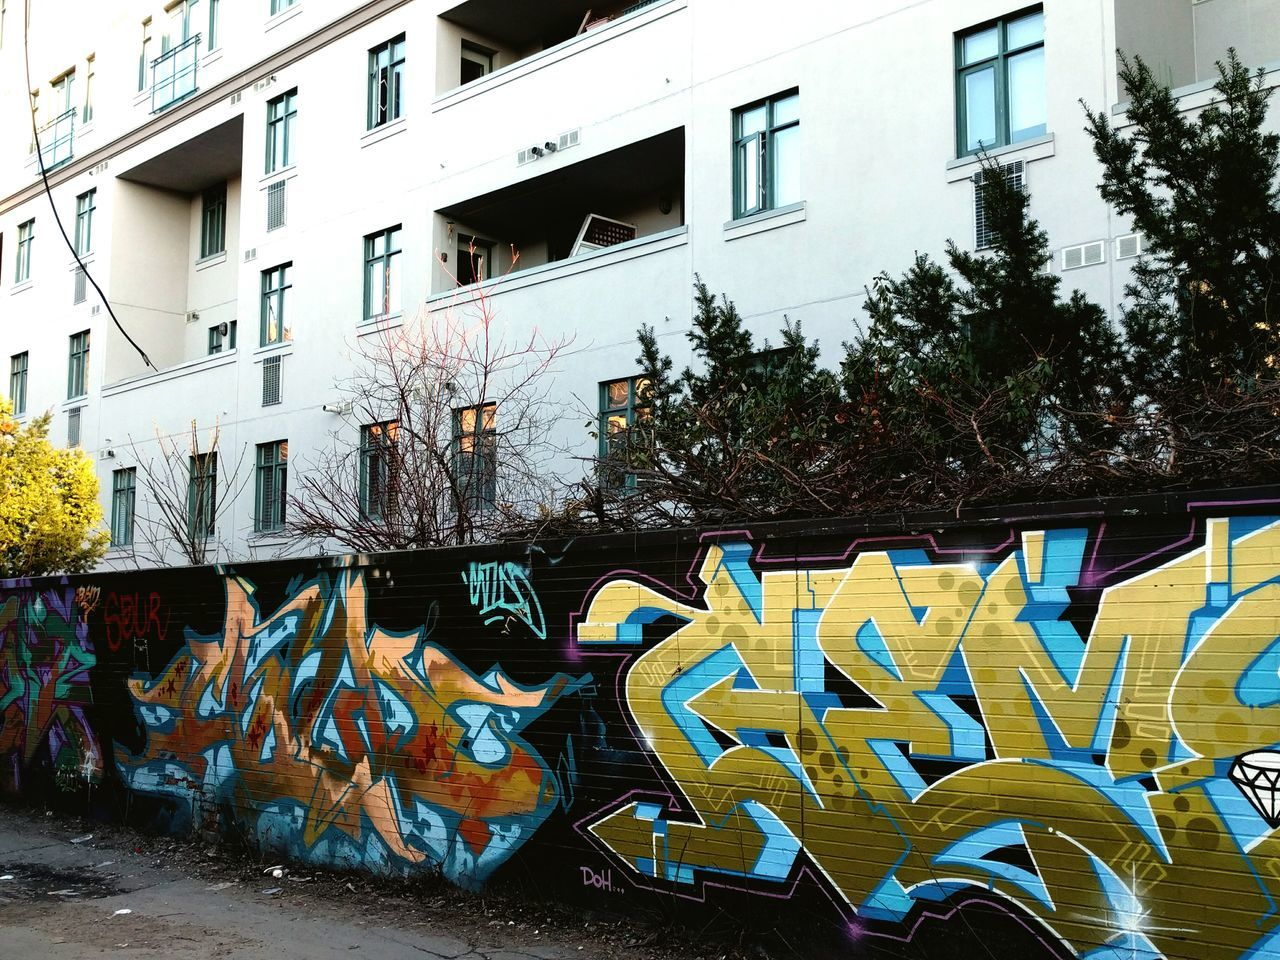 Graffiti Alley Downtown Toronto Toronto Torontophotographer Graffiti Wall Graffiti The World Building Exterior Building Urban Spring Fever